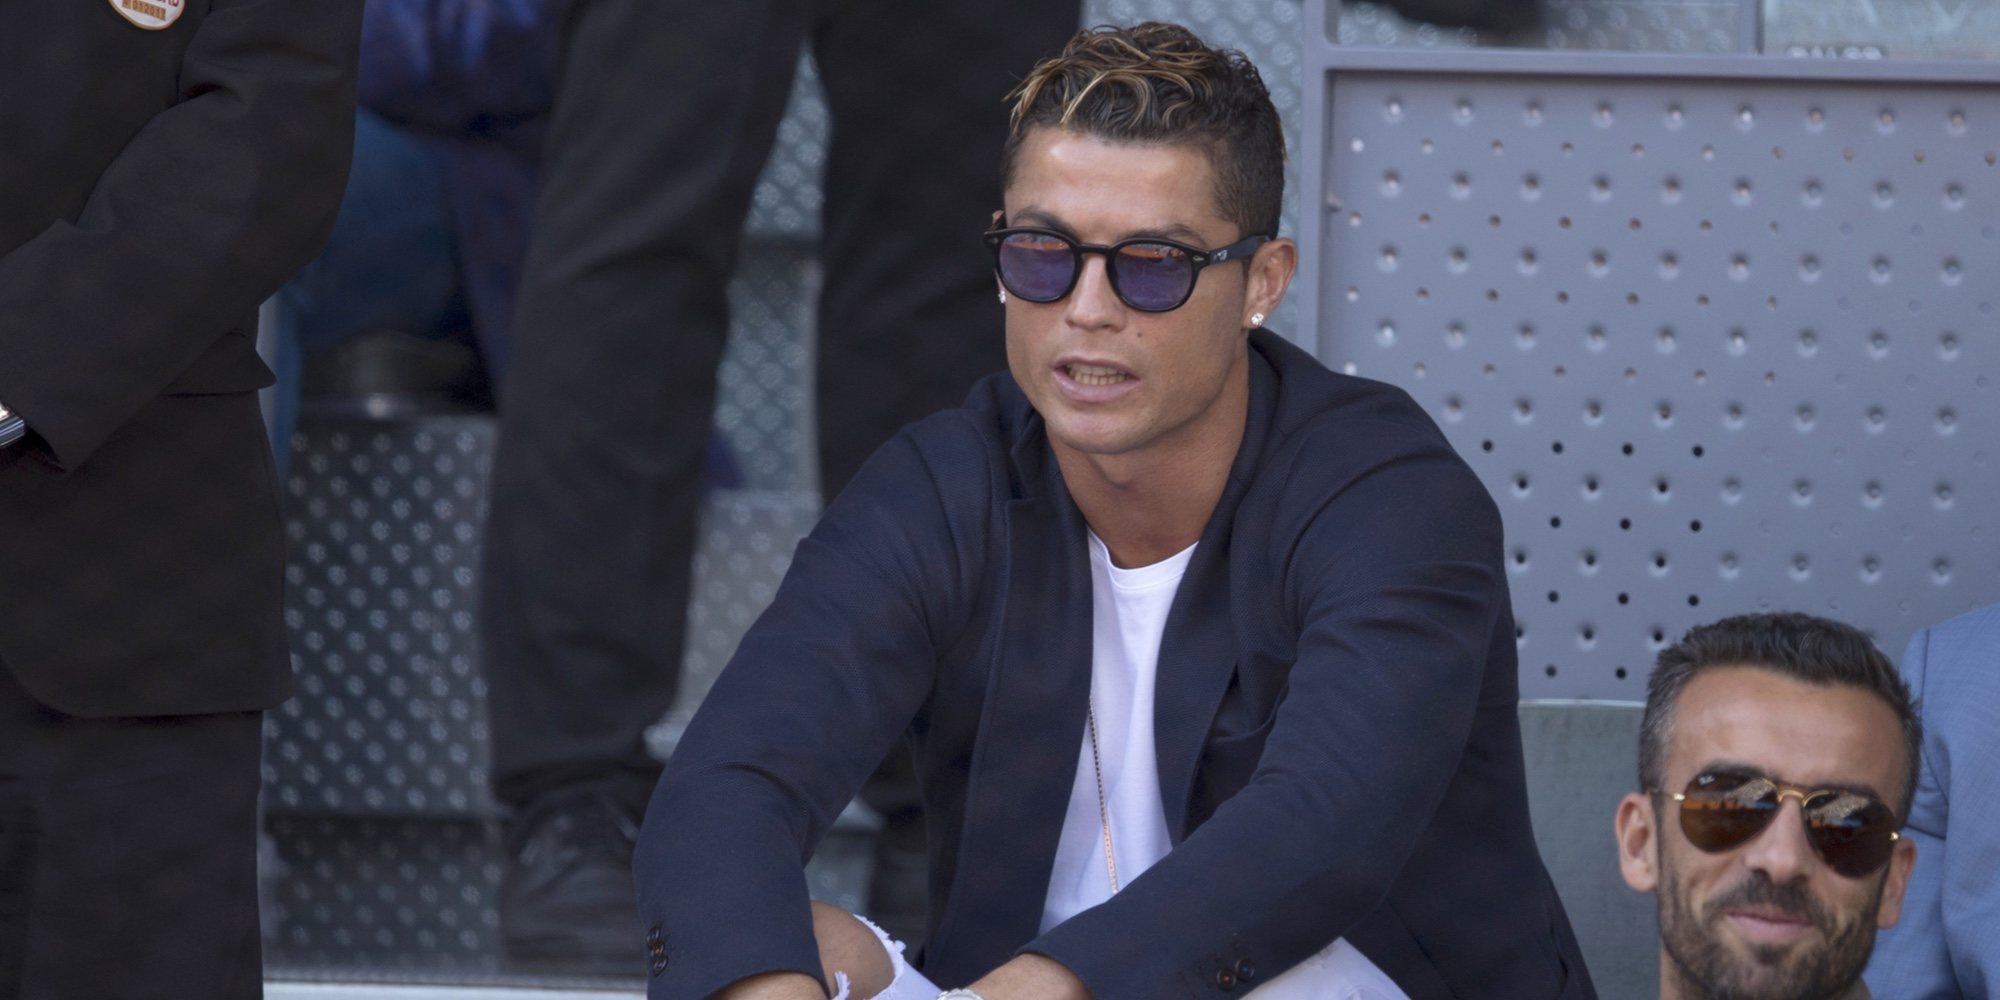 Cristiano Ronaldo demandará a su expareja por difamar contra él